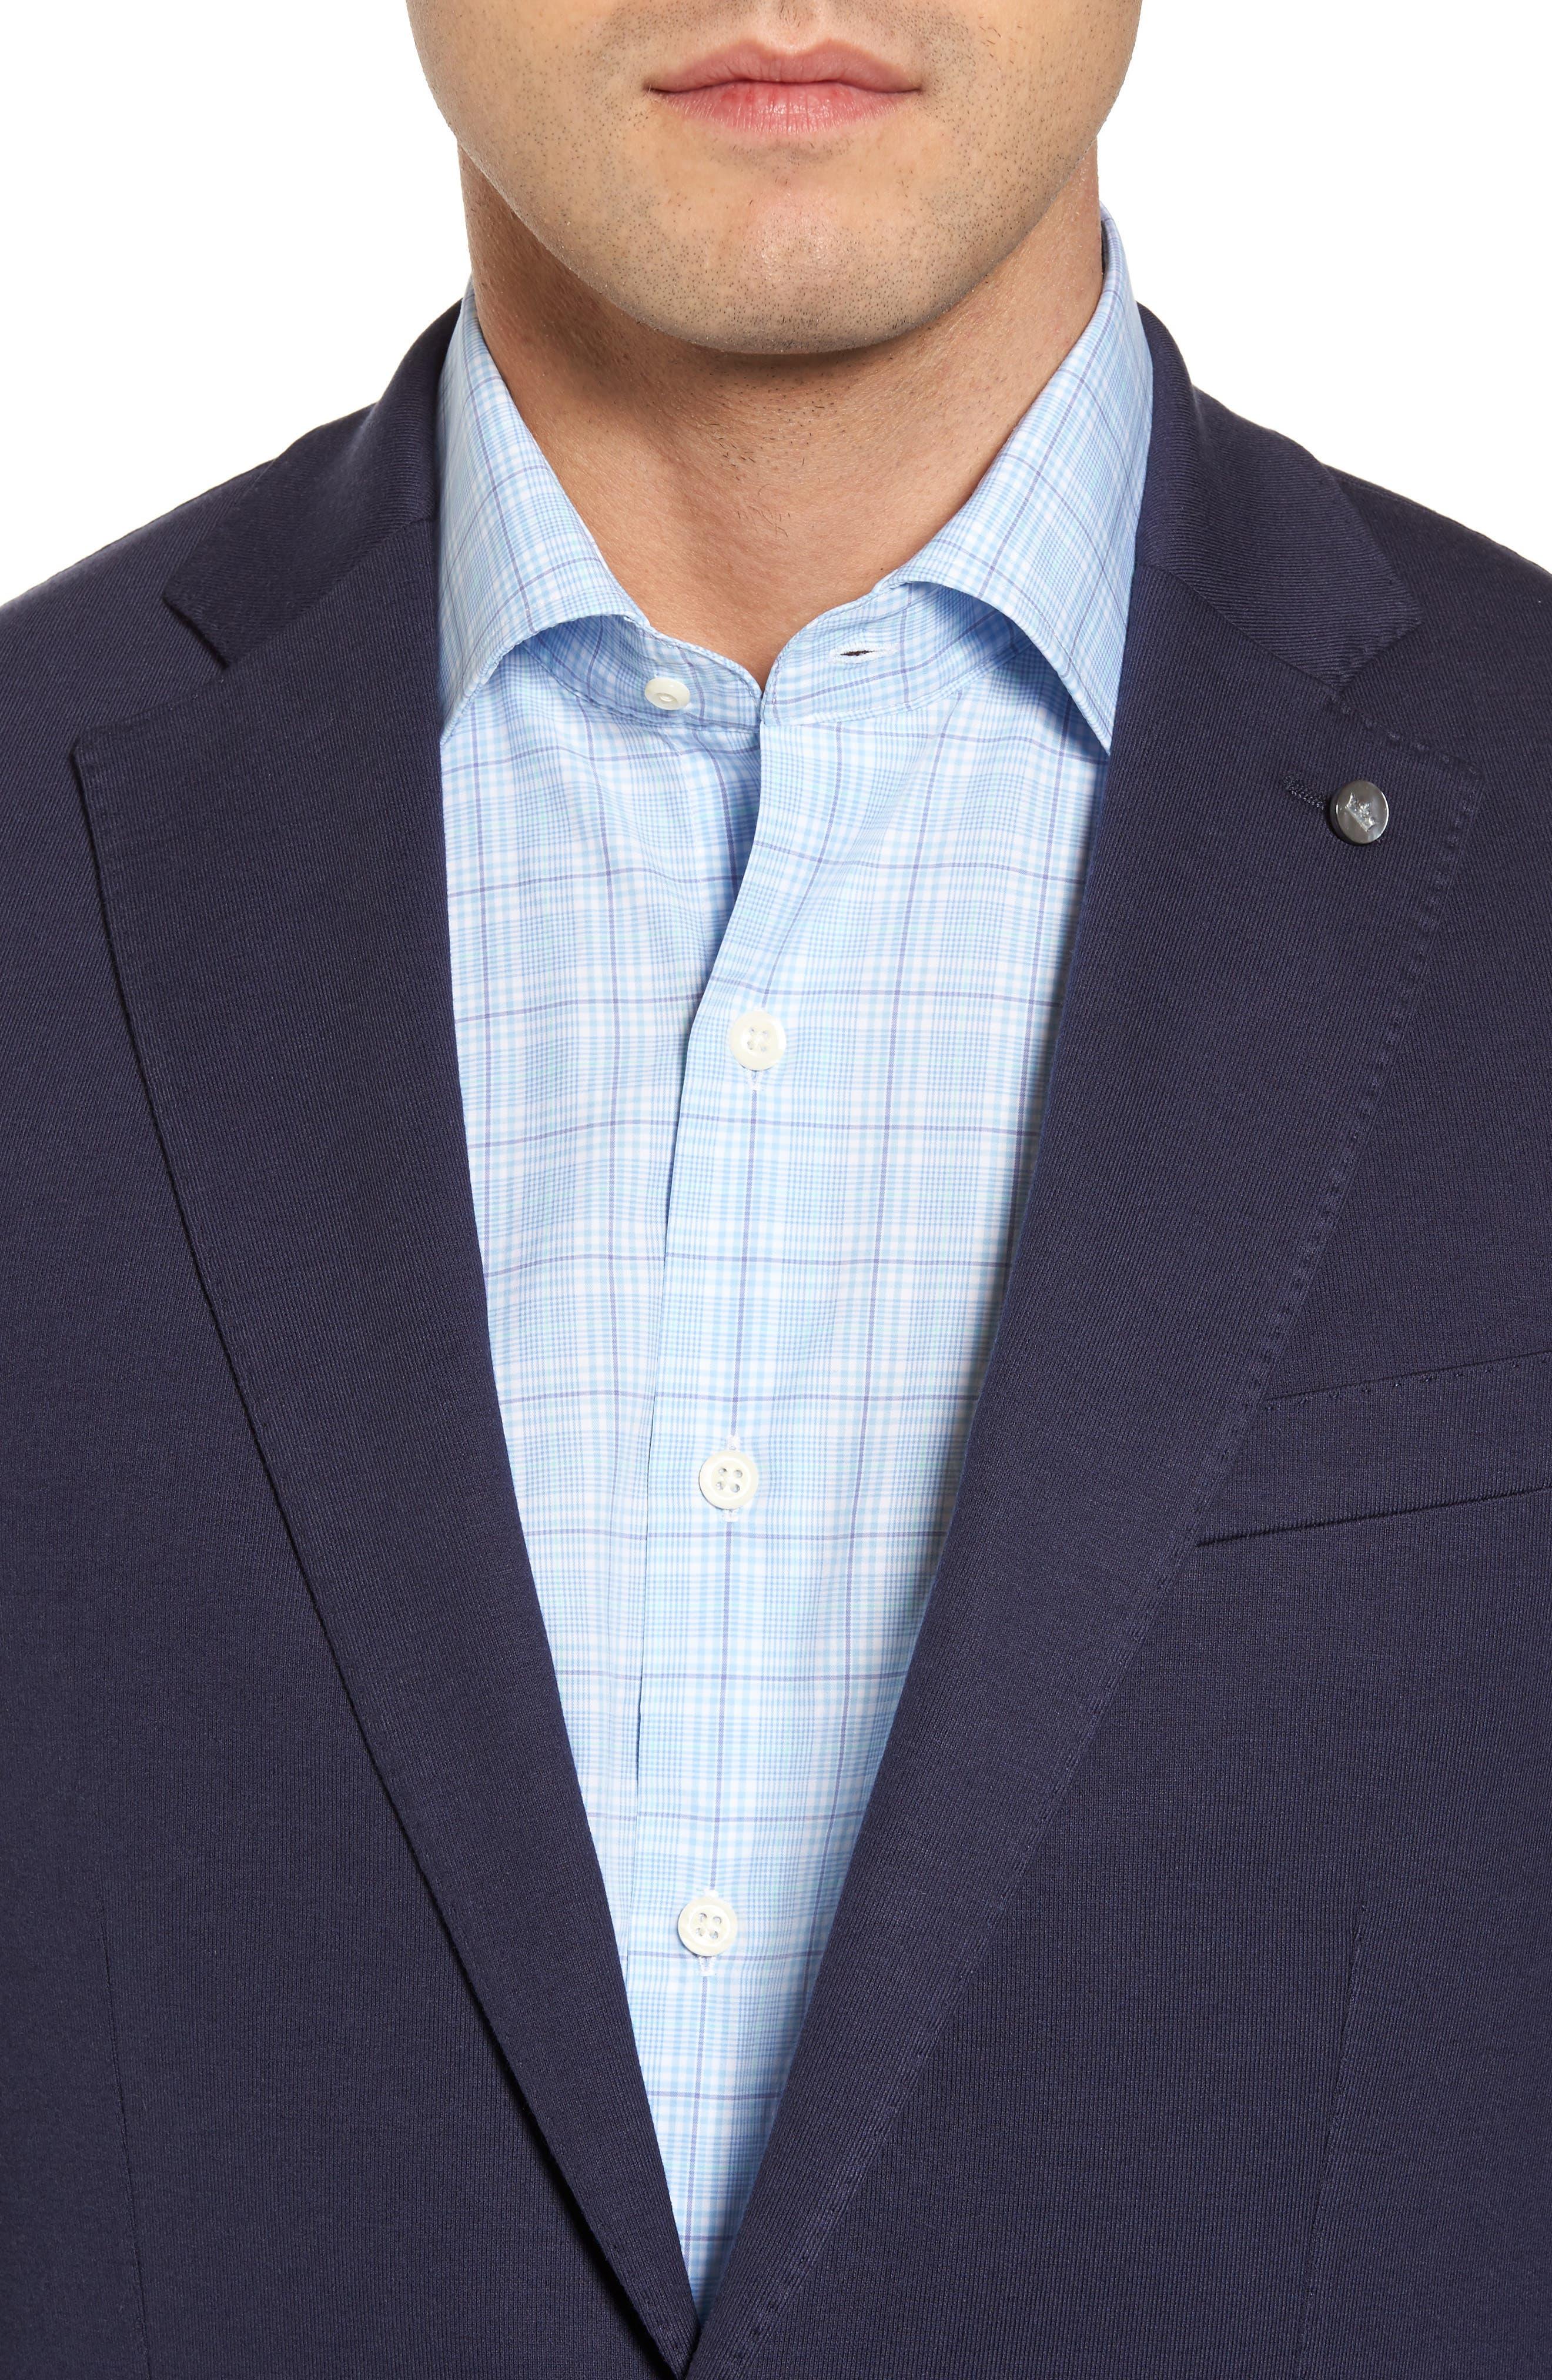 Santorini Jersey Knit Jacket,                             Alternate thumbnail 4, color,                             417